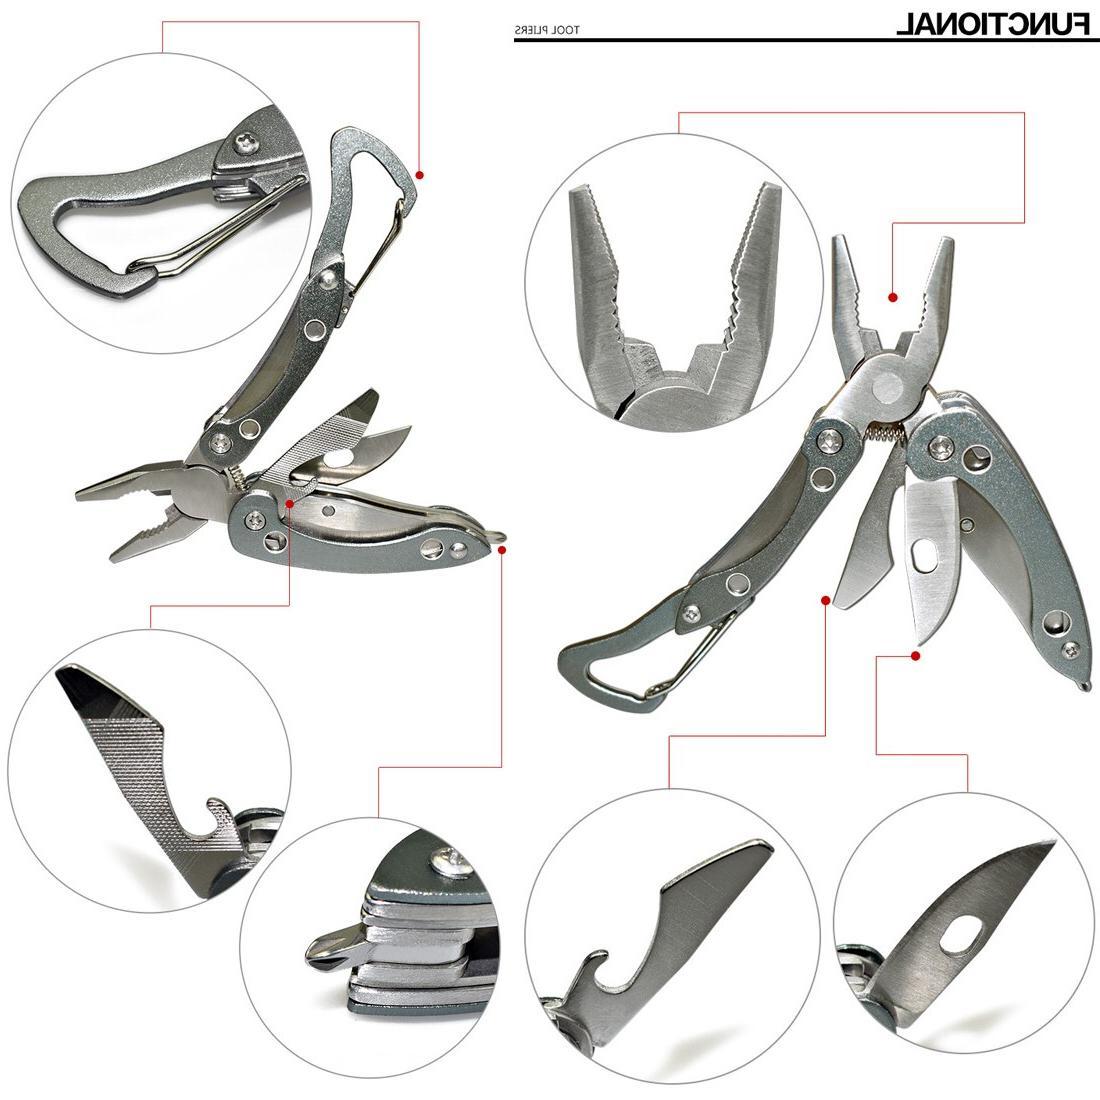 New Brand <font><b>Camping</b></font> Tool Tactical <font><b>Folding</b></font> Knife Stainless Travel Kit Pliers